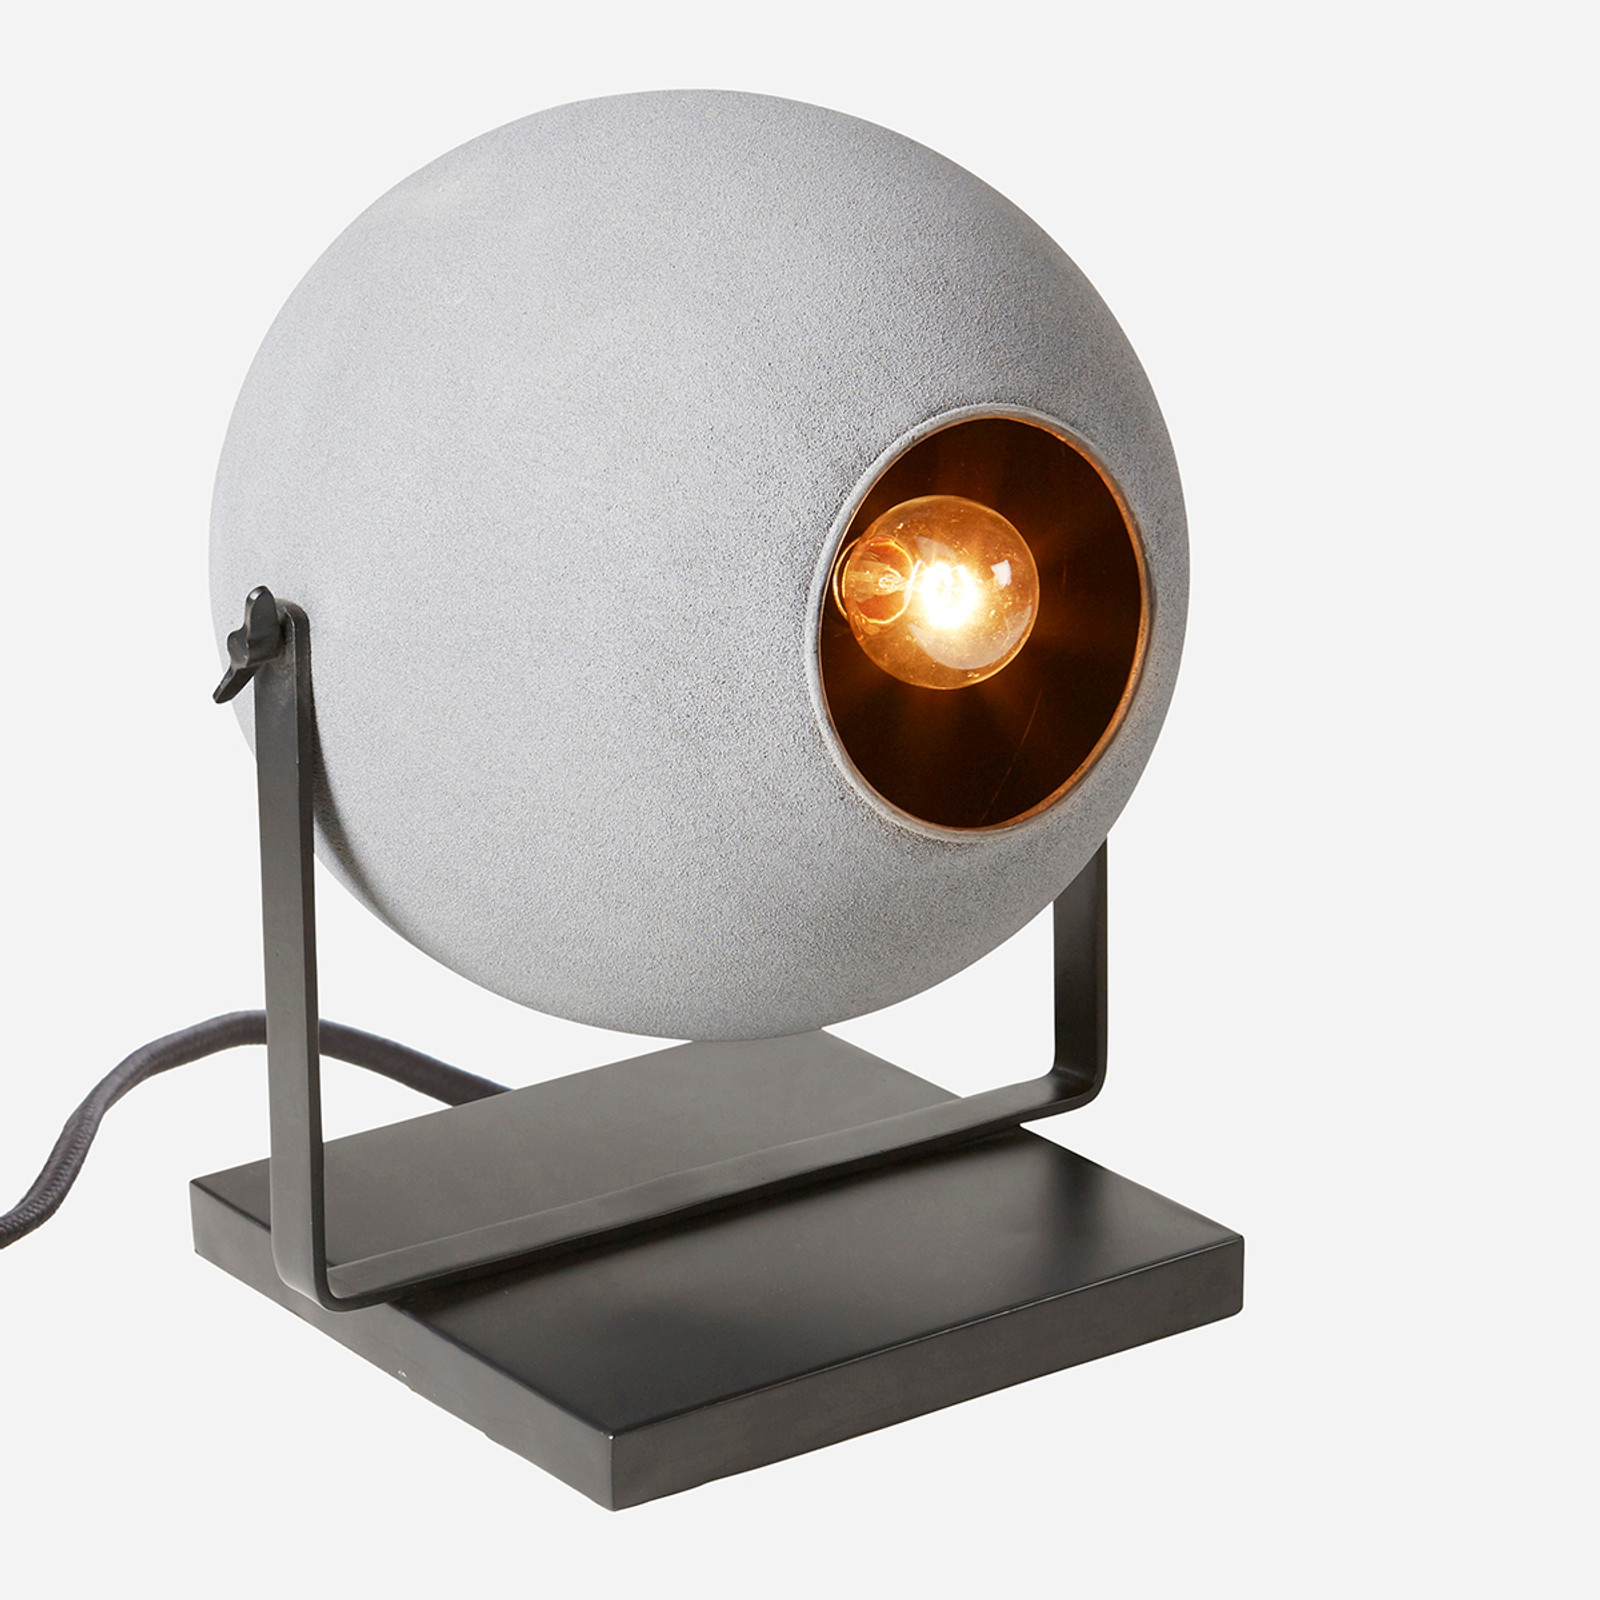 Concrete Spot Light (WHS Open Box Stock)